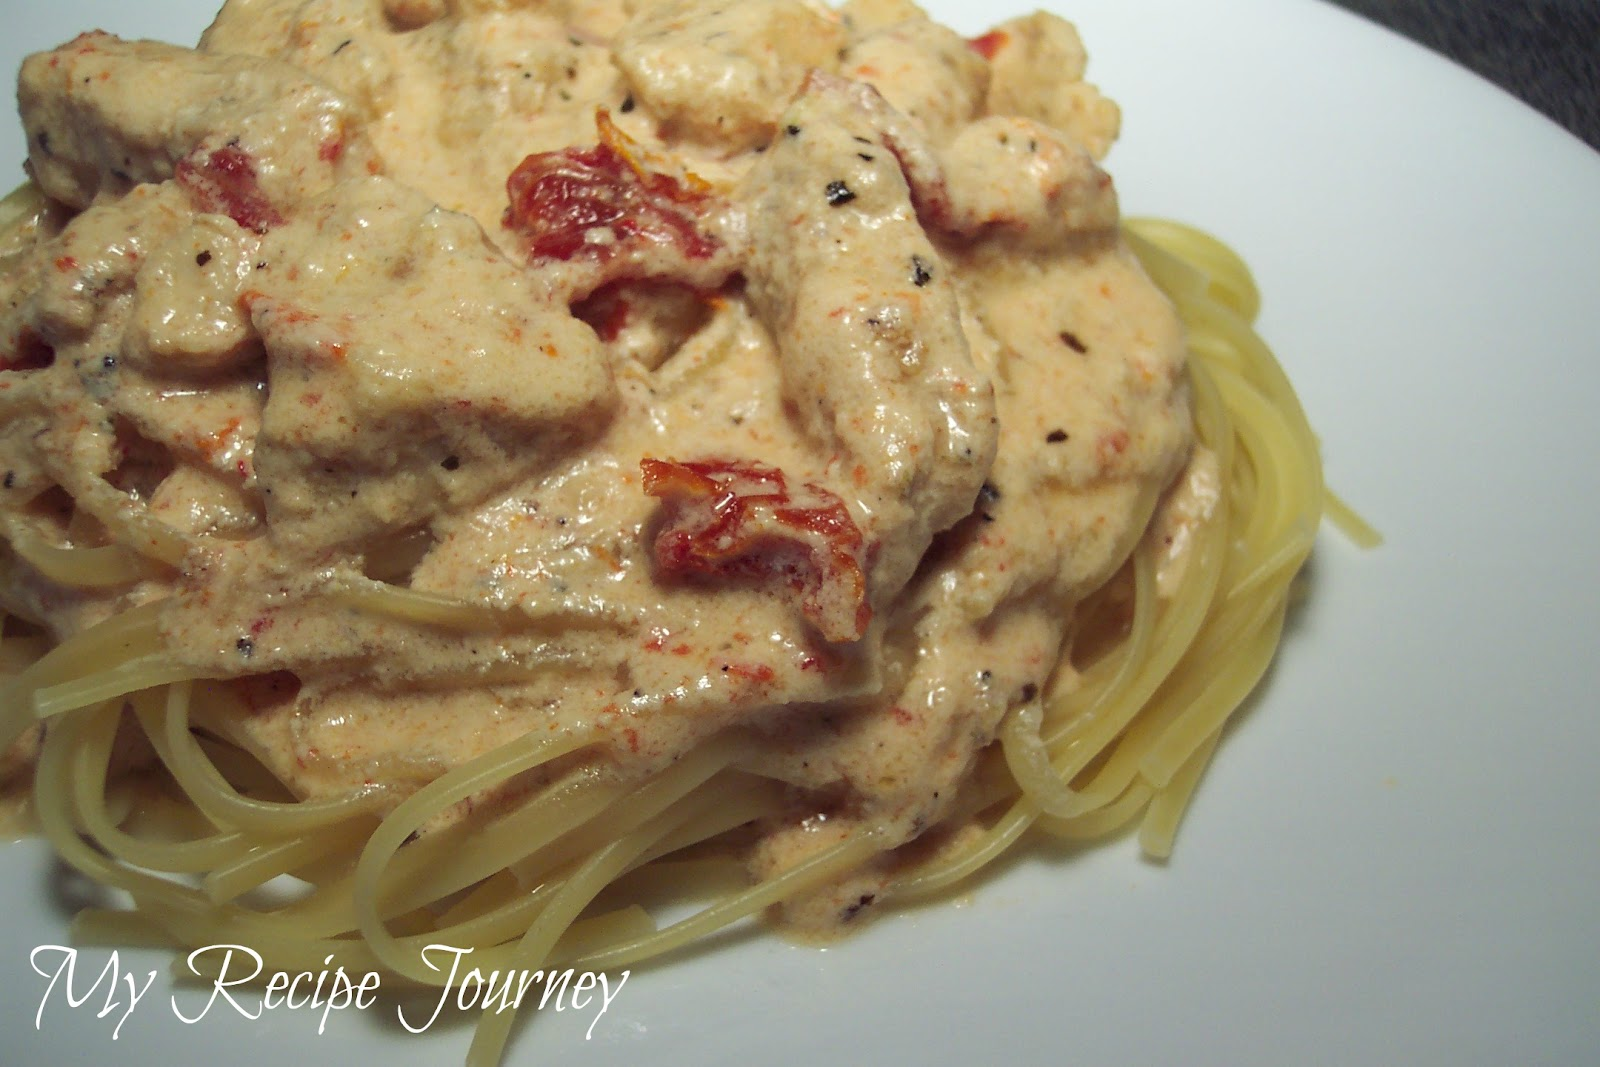 My Recipe Journey: Creamy Cajun Chicken Pasta